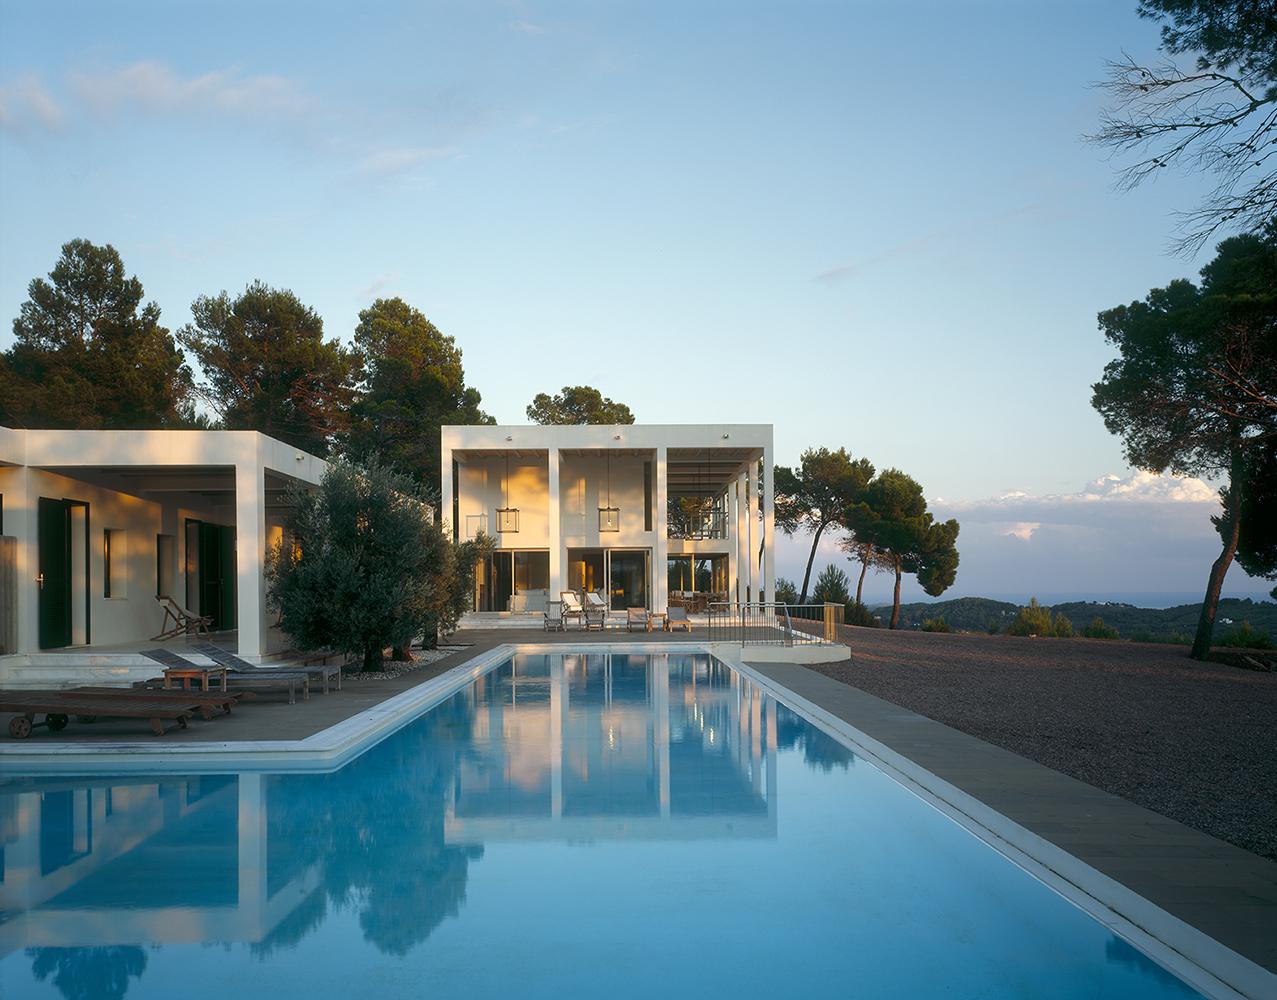 1 Morna Valley, Ibiza - Front